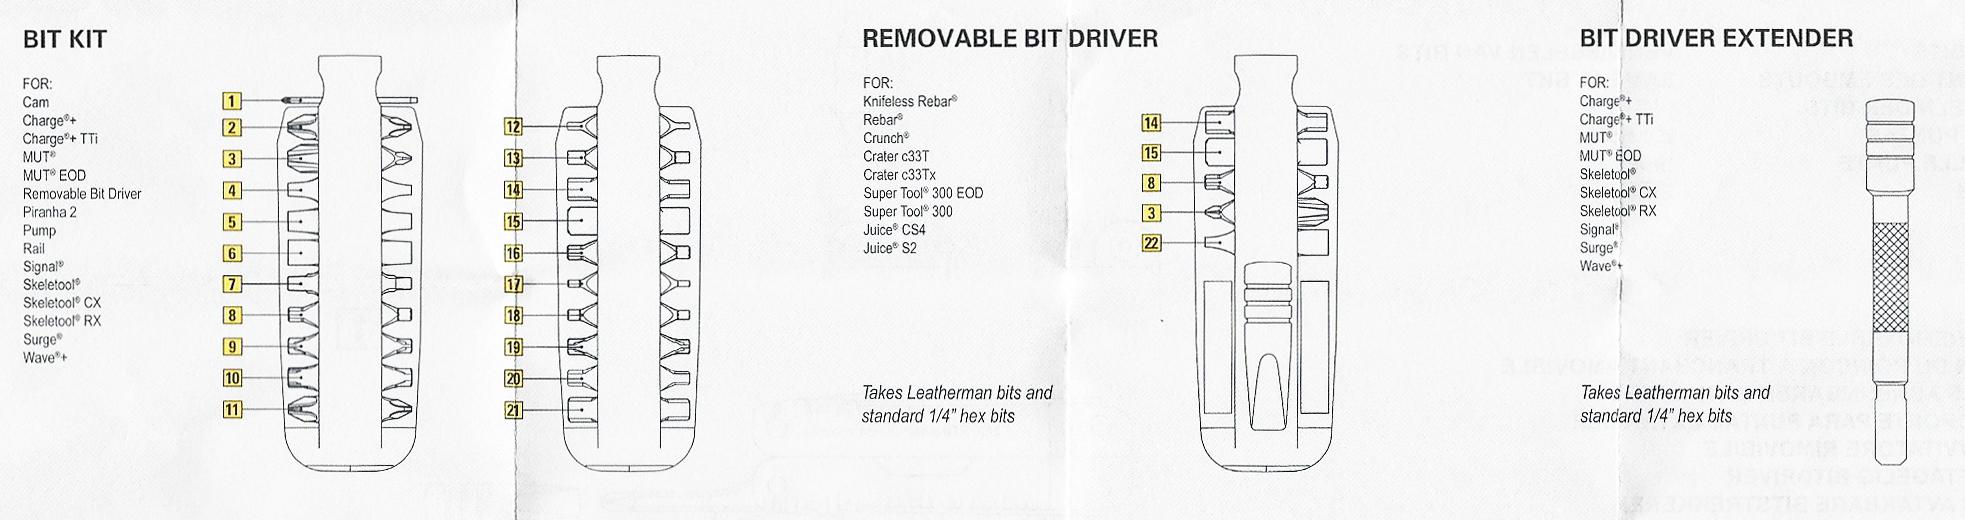 Leatherman Bit Kit, Bit Driver and Driver Extender